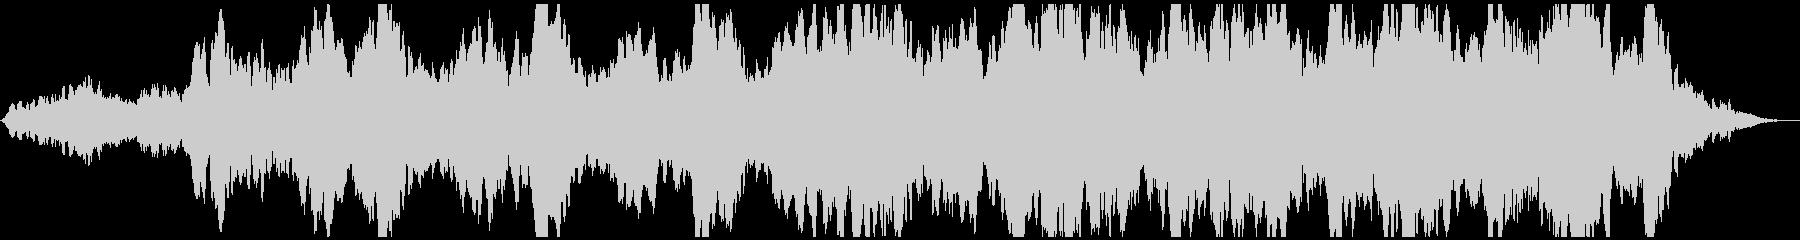 PADS 共鳴する01の未再生の波形